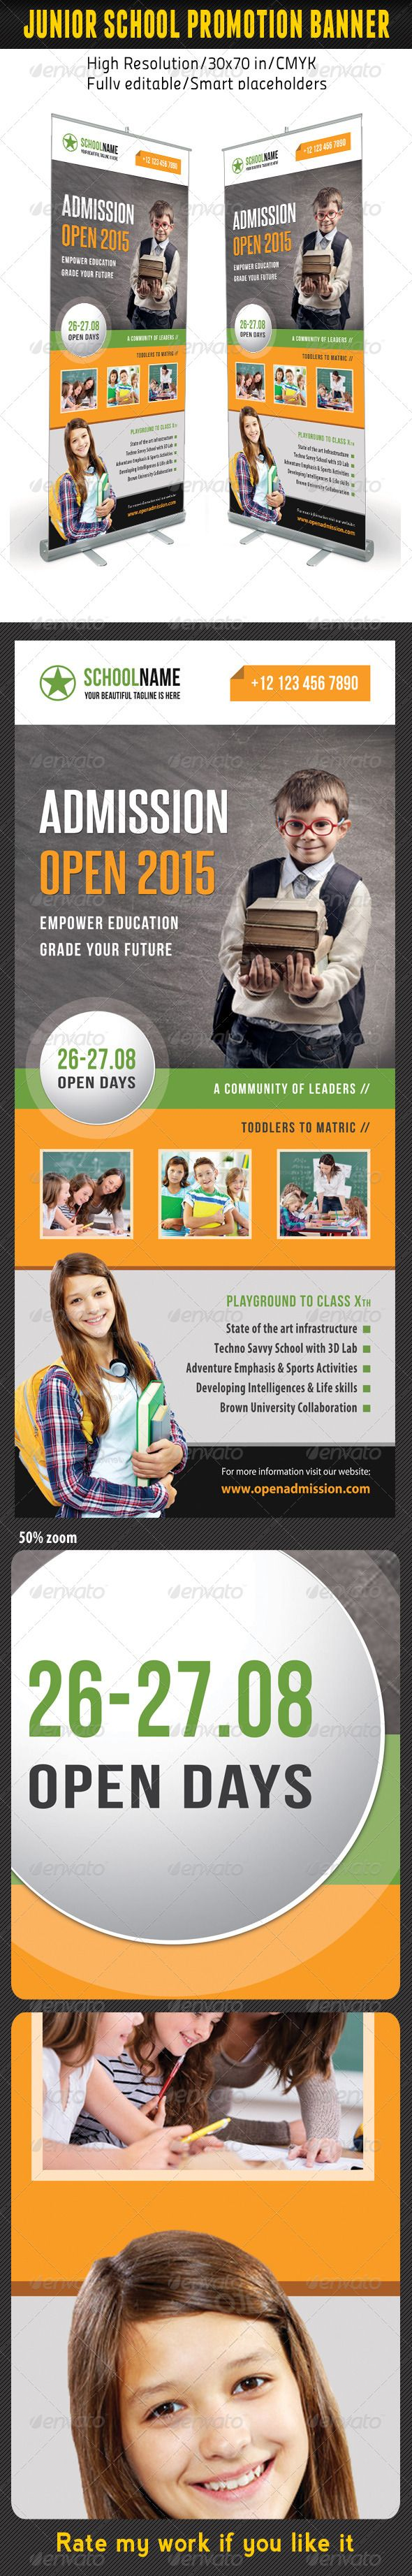 Junior School Promotion Banner Template 10 — Photoshop PSD #signboard #banner ...